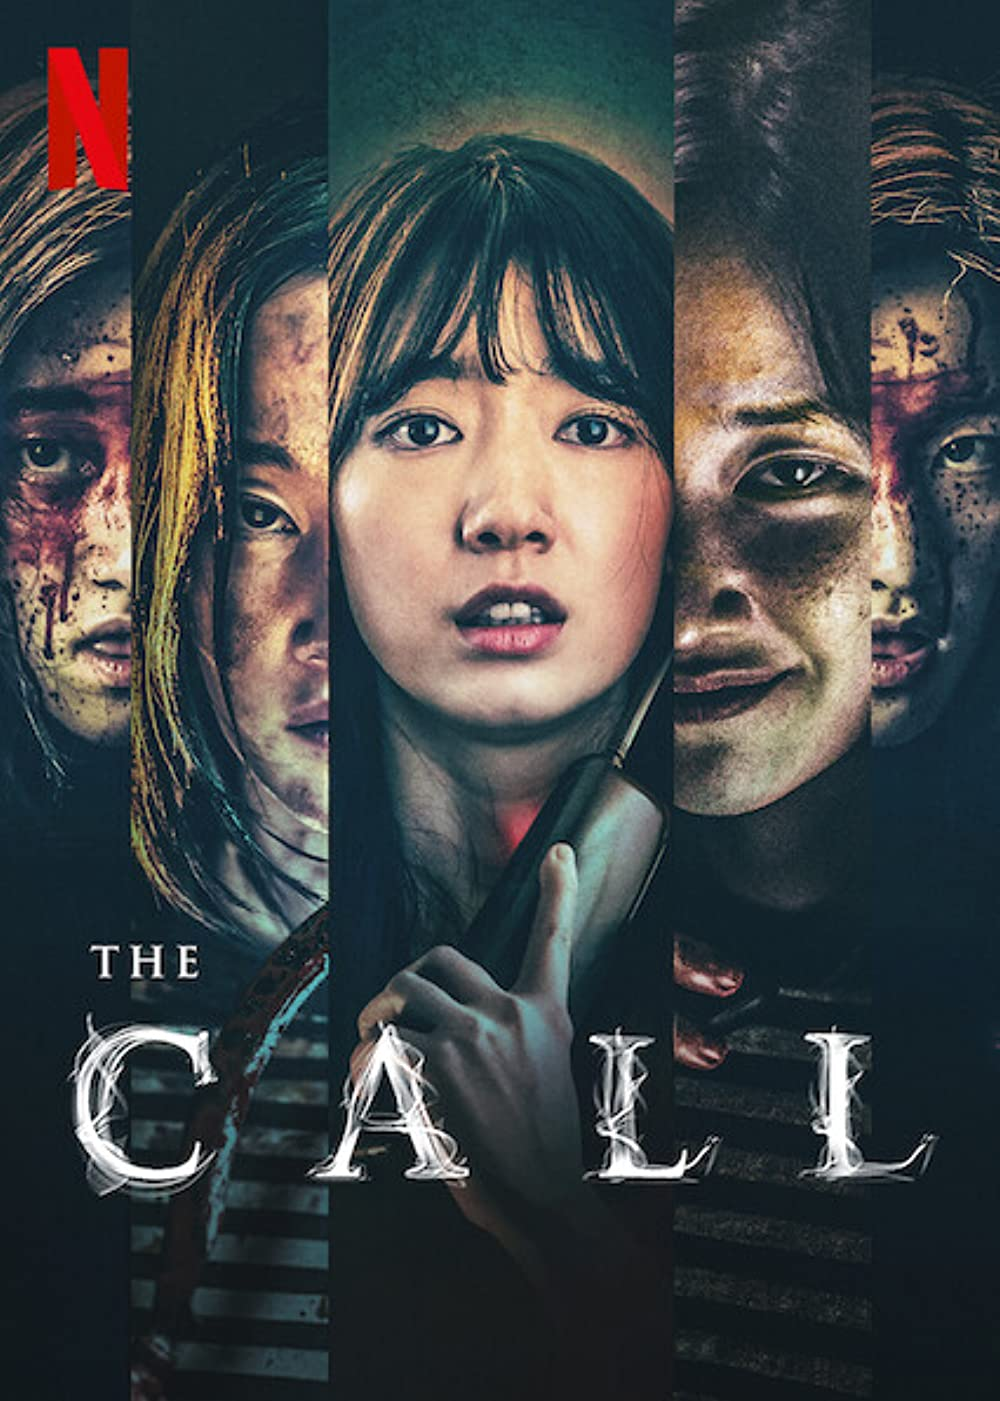 Download Film Korea The Call Subtitle Indonesia - Zero Lite